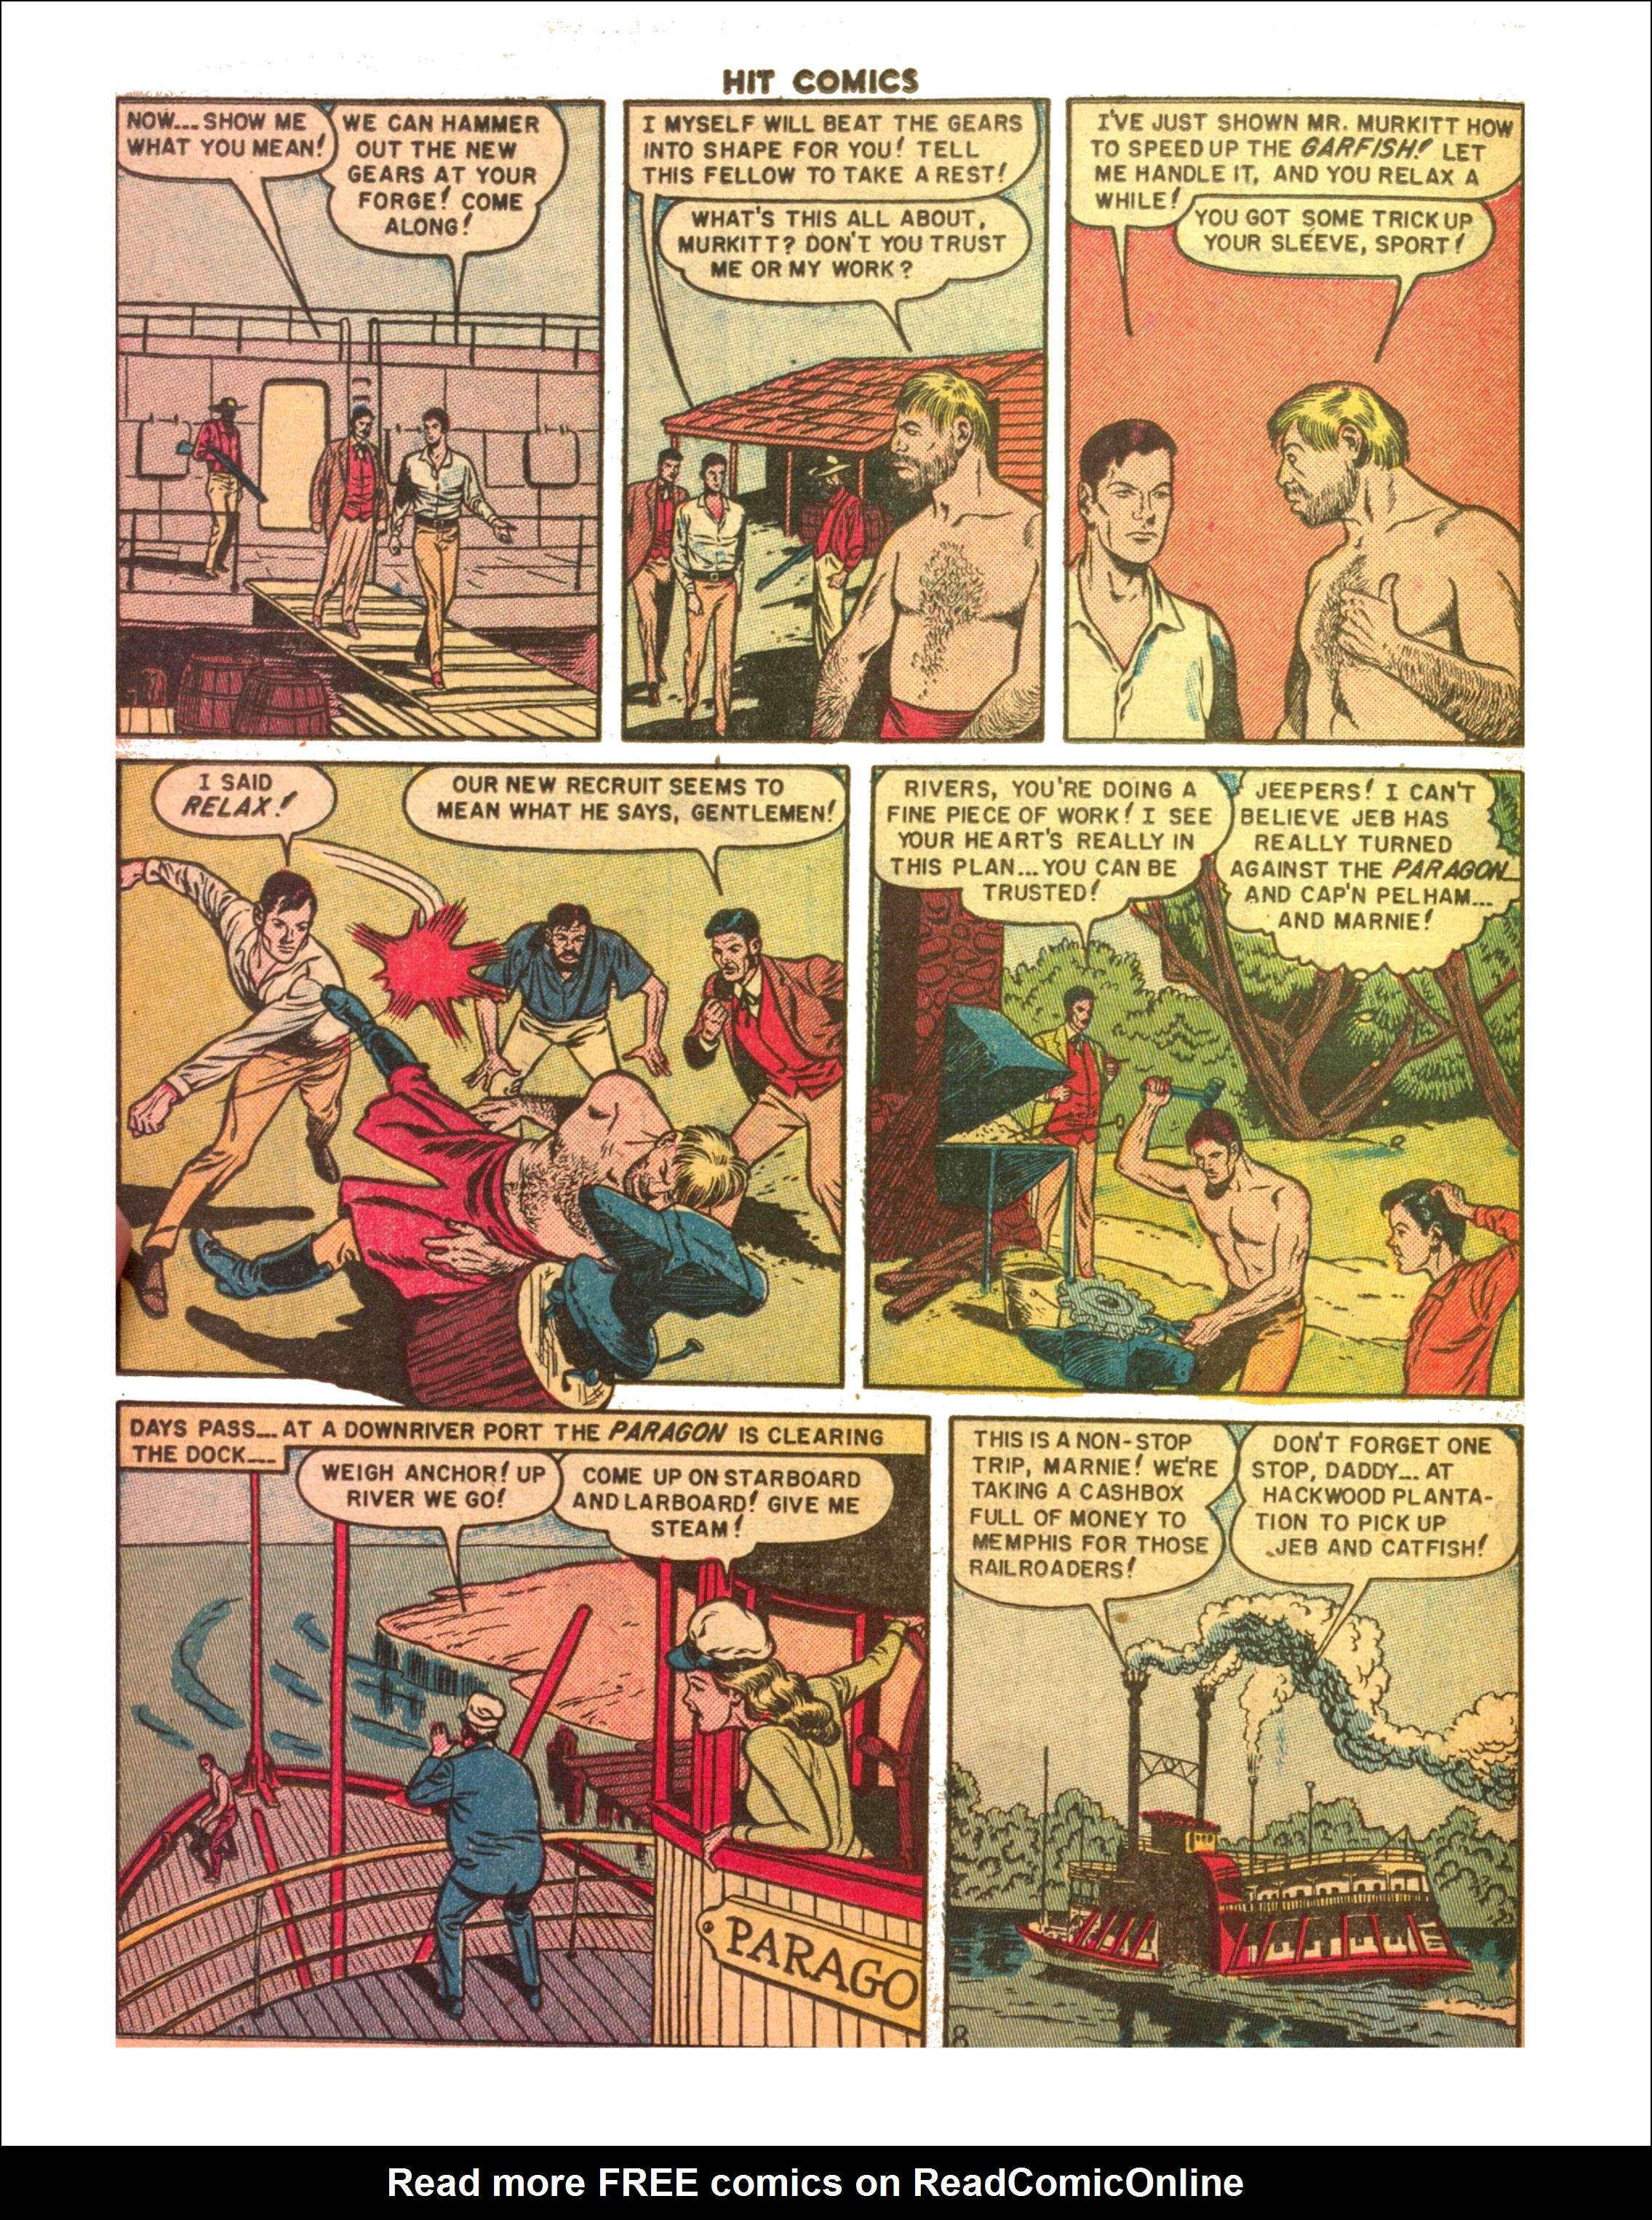 Read online Hit Comics comic -  Issue #65 - 10